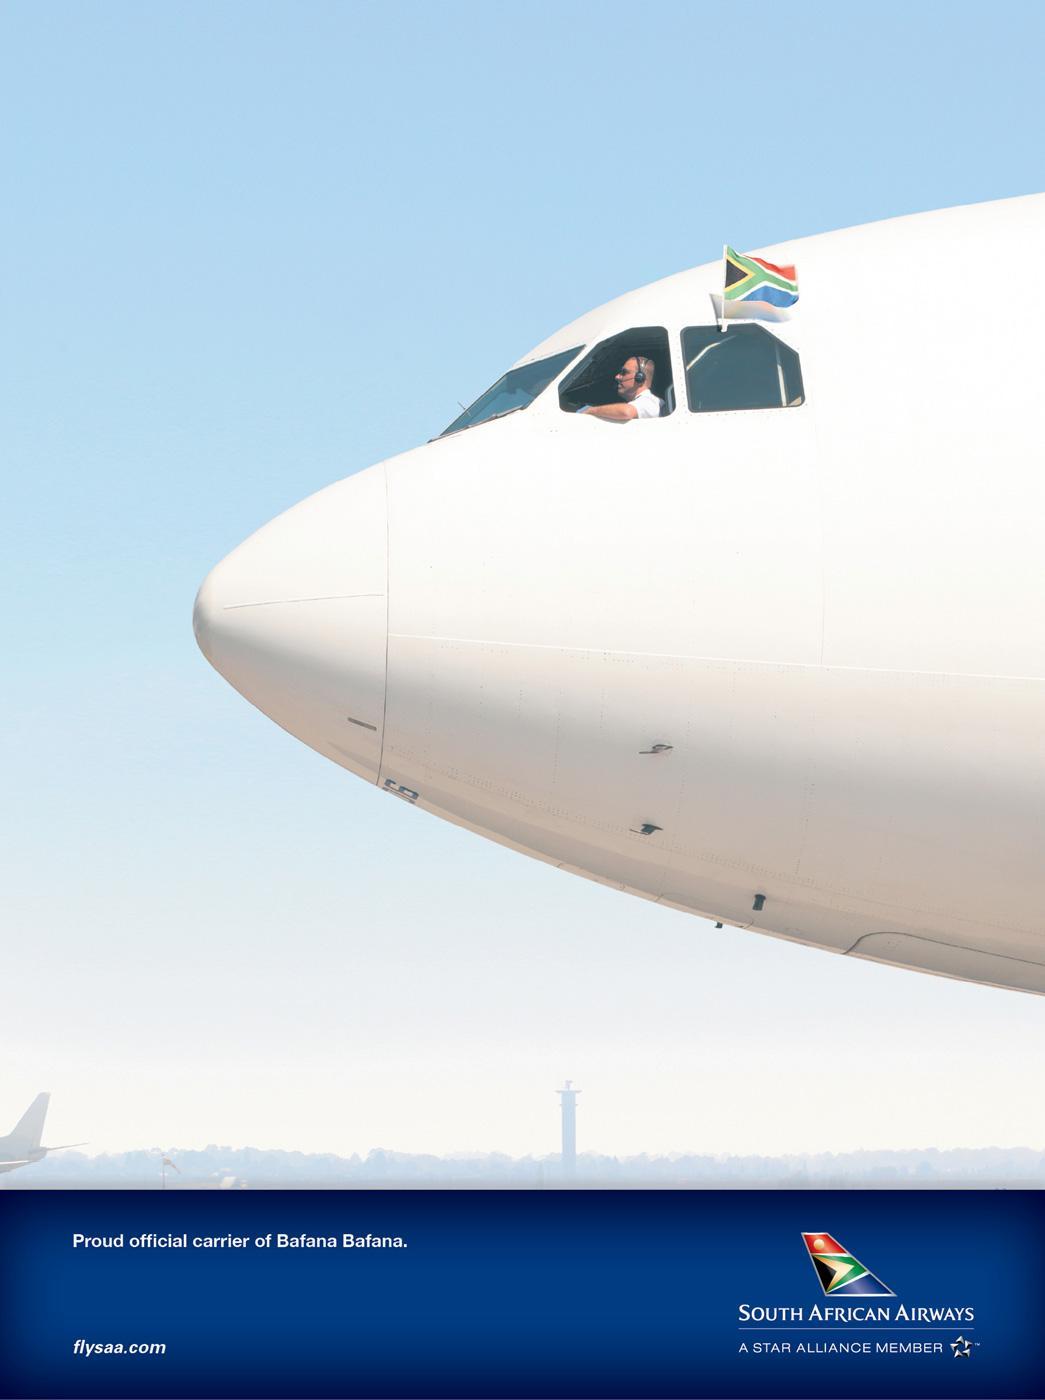 South African Airways Print Ad -  Bafana Bafana